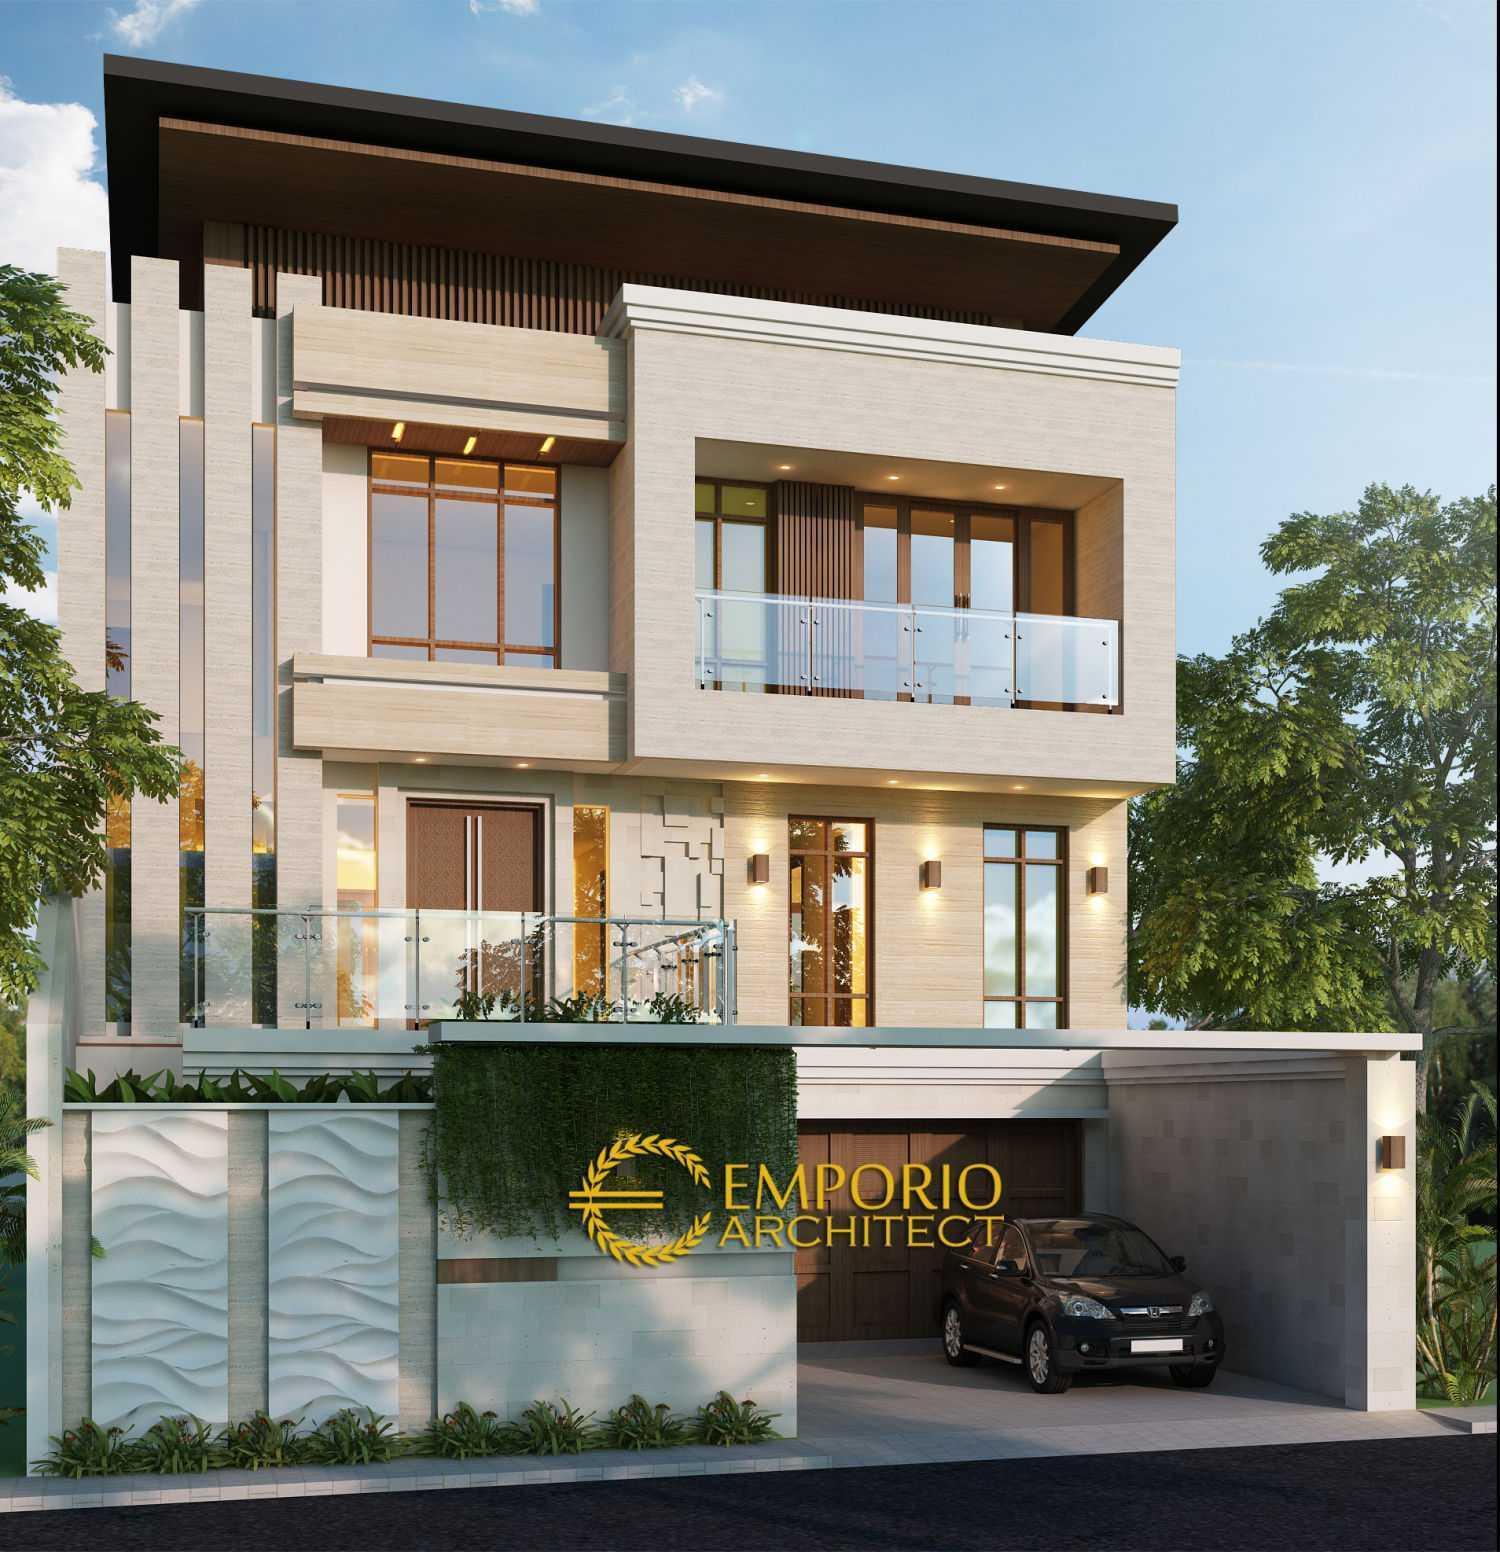 Jasa Desain Kamar Tidur Di Makassar: Photo Emporio-architect-jasa-arsitek-bandung-desain-rumah